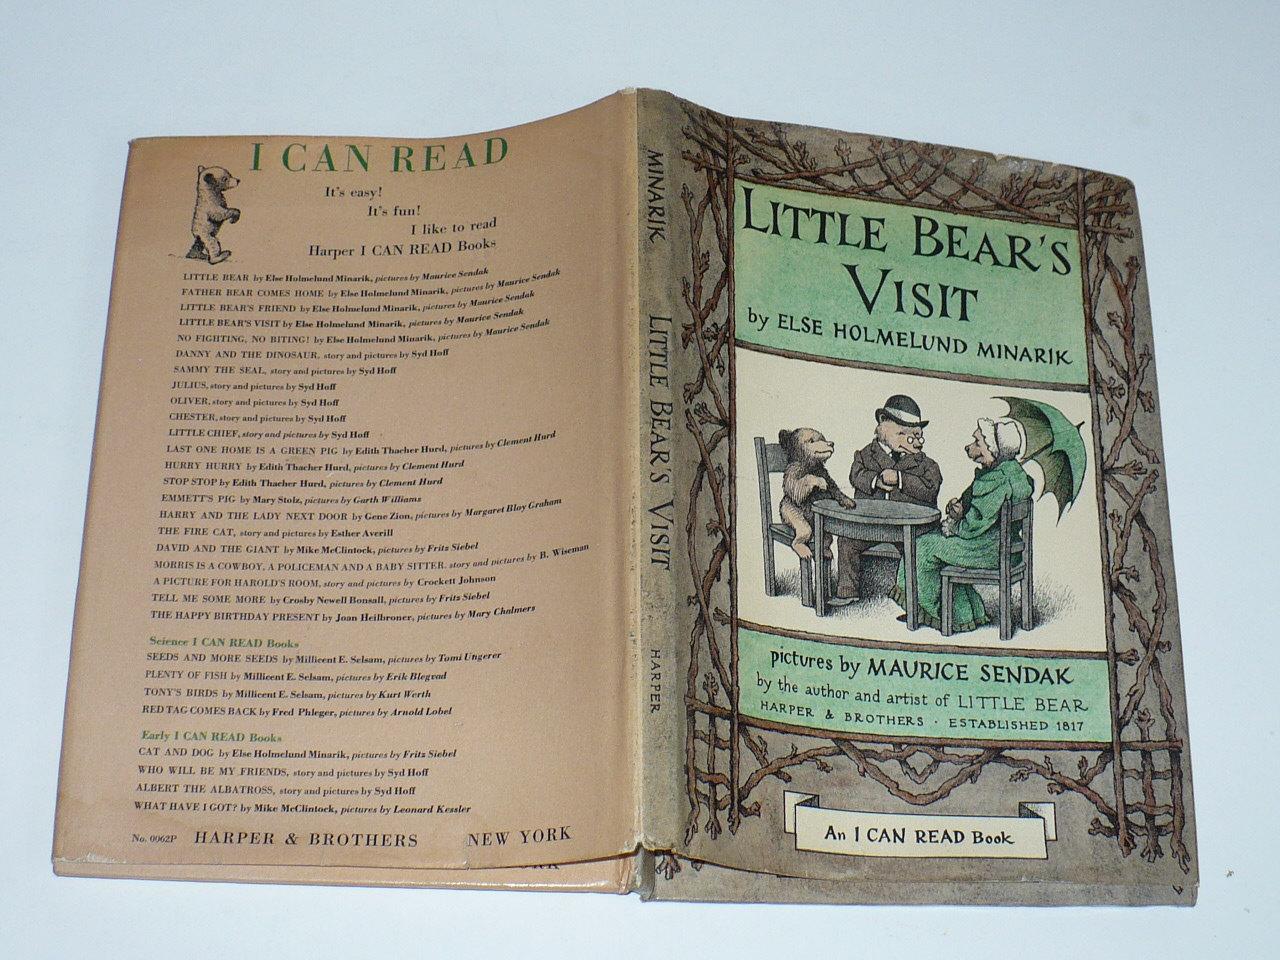 Else Holmelund Minarik, Little Bears Visit, Maurice Sendak, Harper Bros 1961,